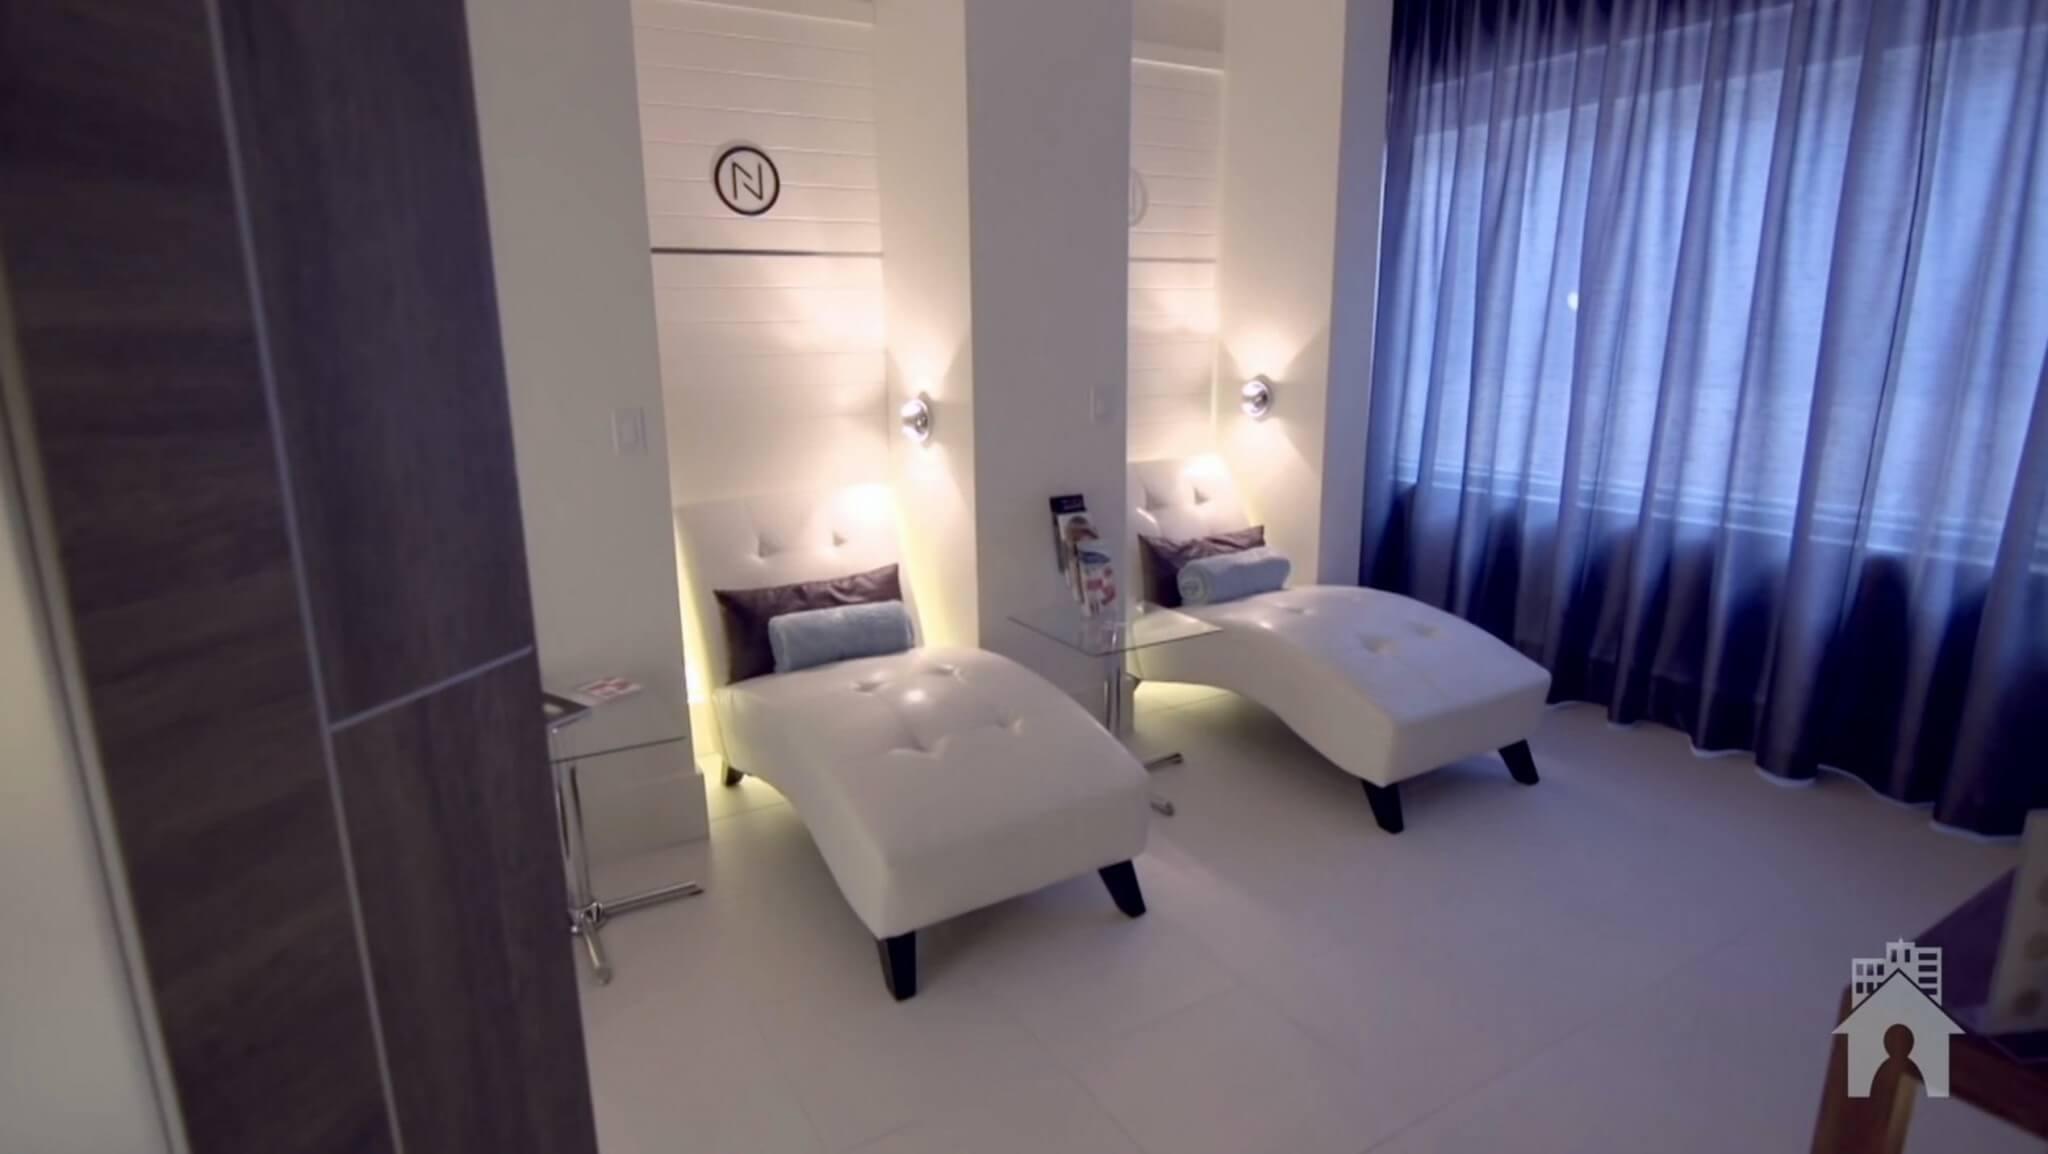 ideas for a spa center